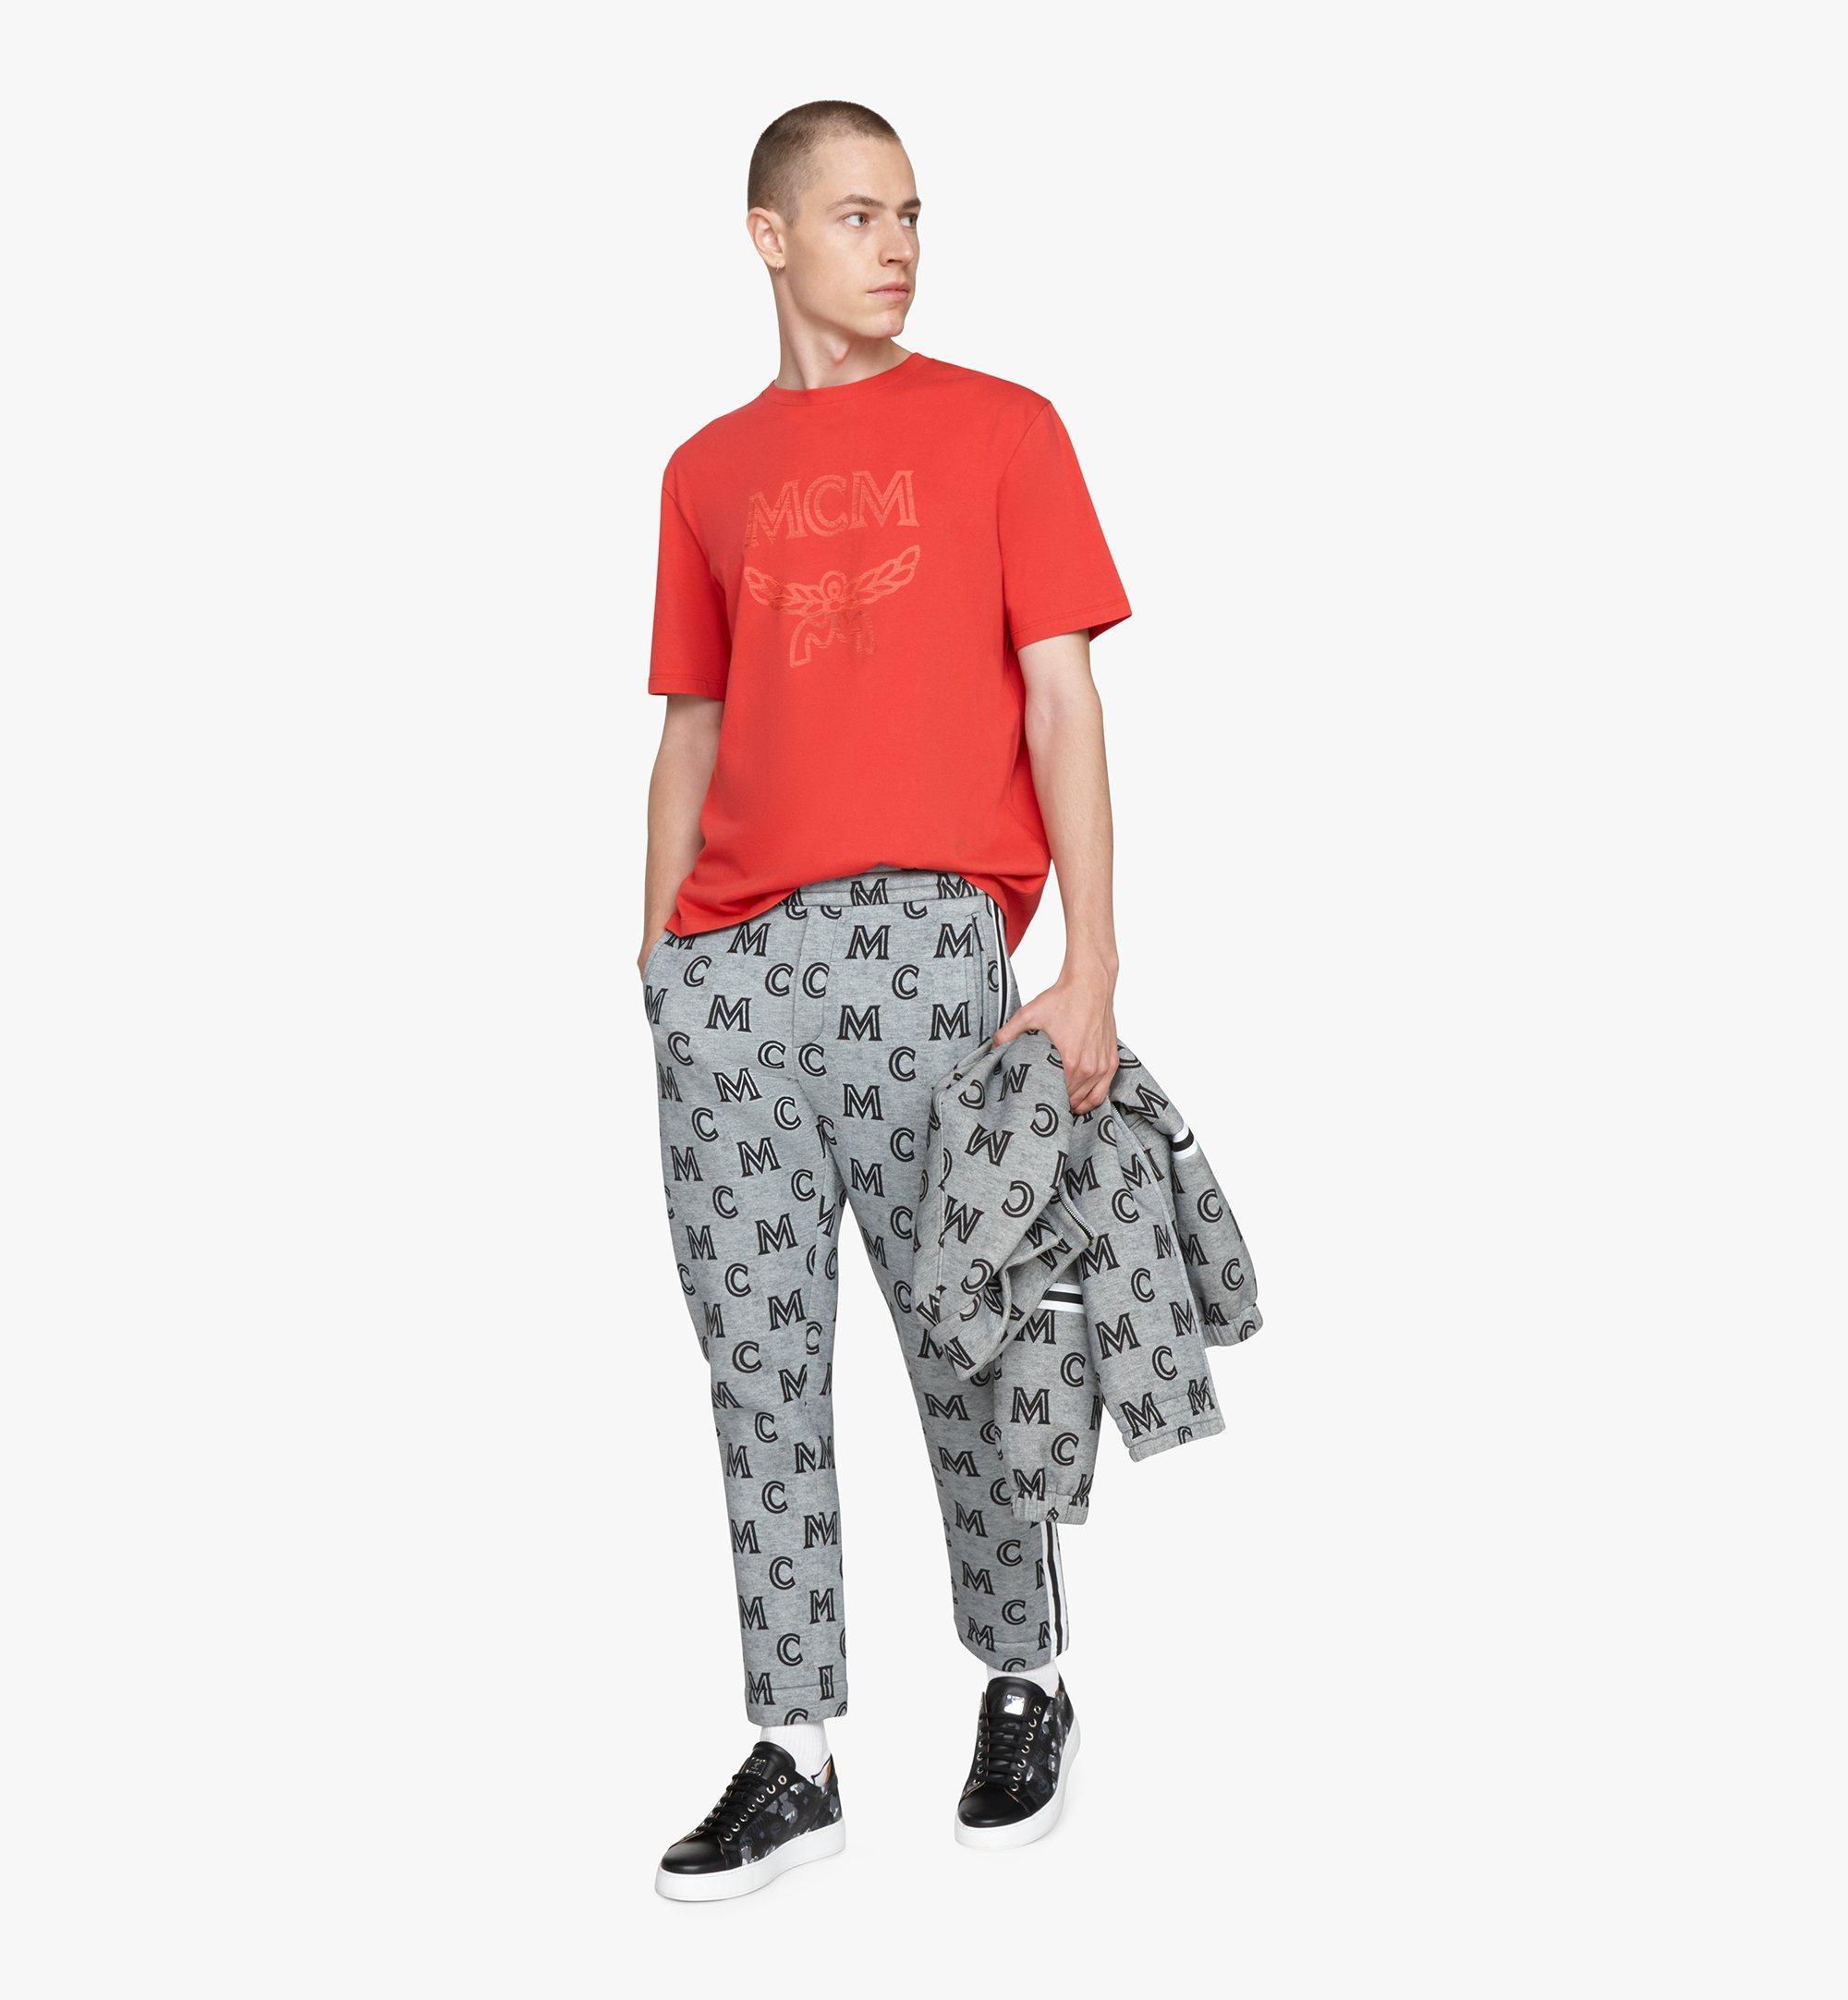 MCM メンズ ロゴ Tシャツ Red MHTASMM04R400L Alternate View 3